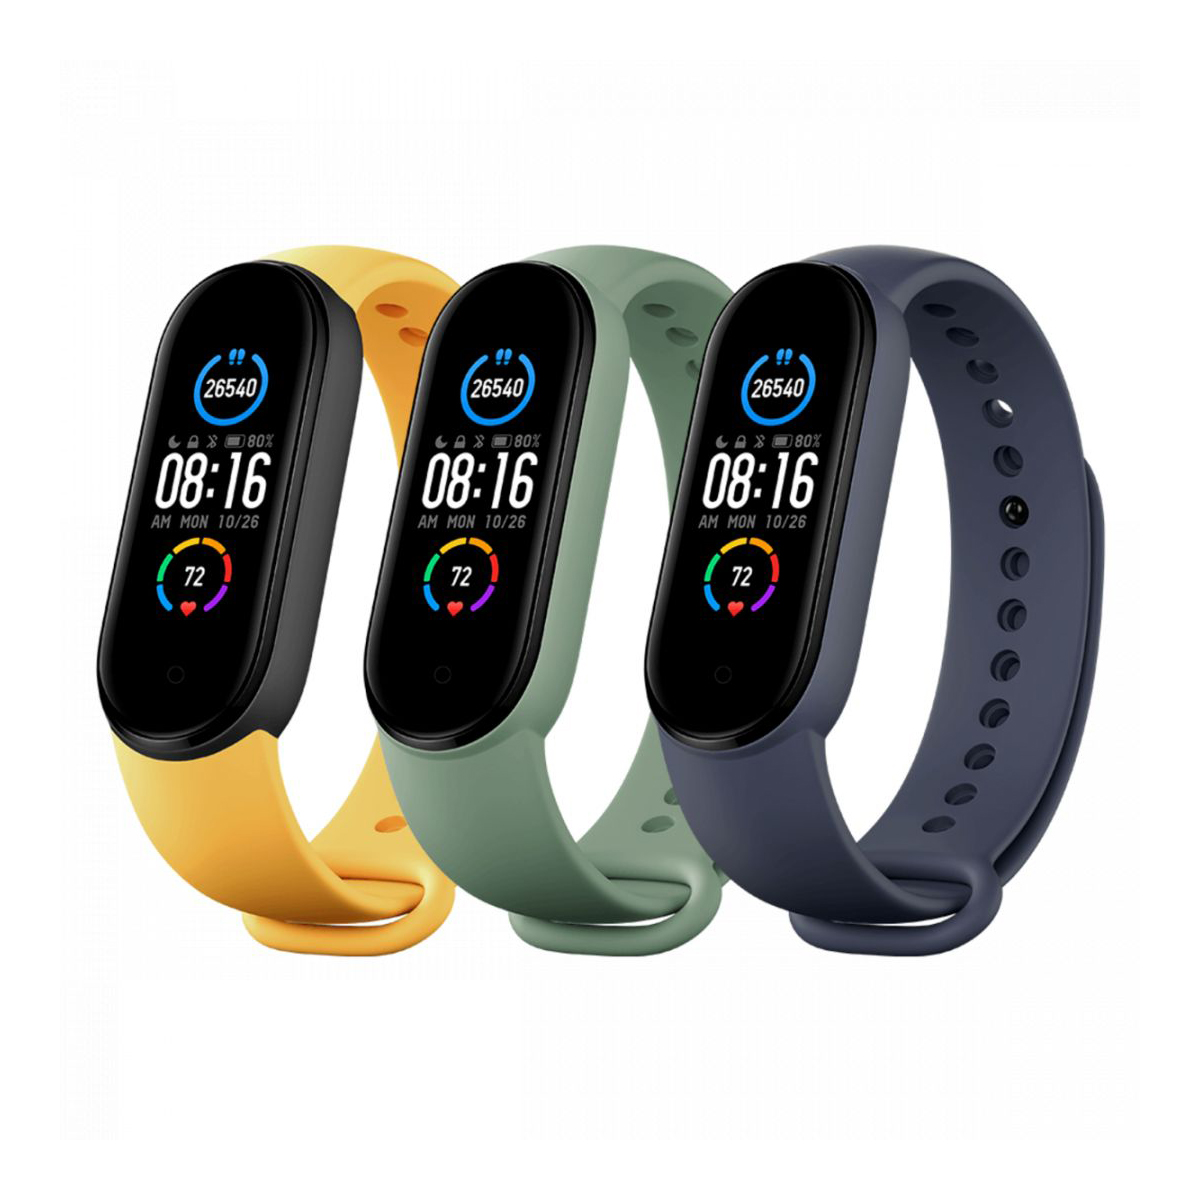 Mi Smart Band 5/6 Strap (3-Pack) Blue/Green/Yellow - pánt kék, zöld, sárga